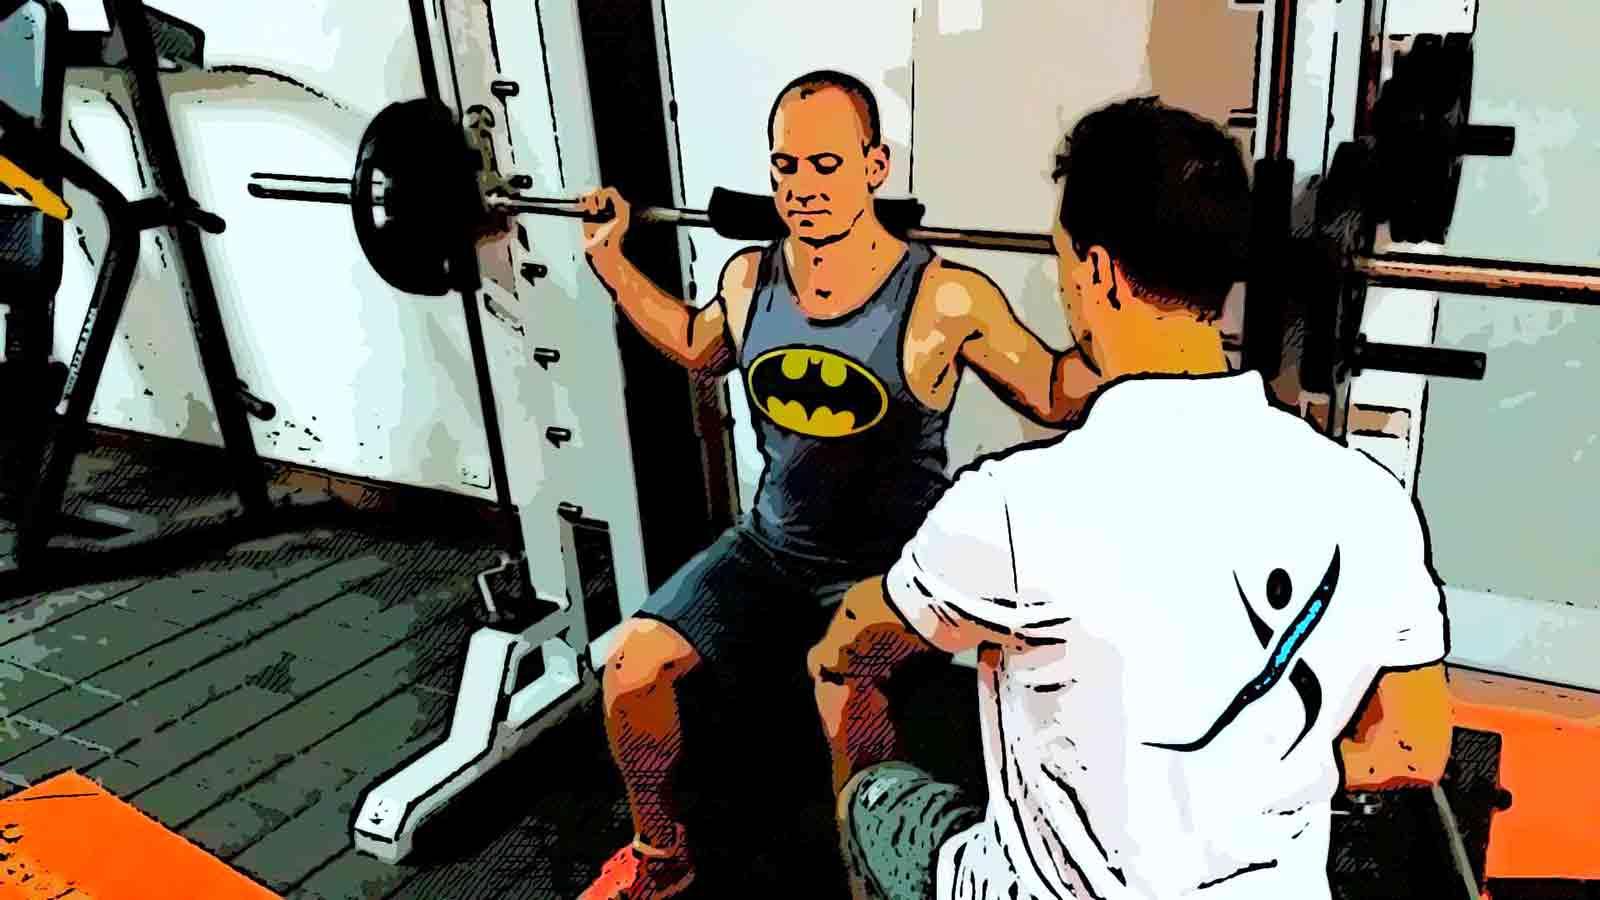 Squat strength test